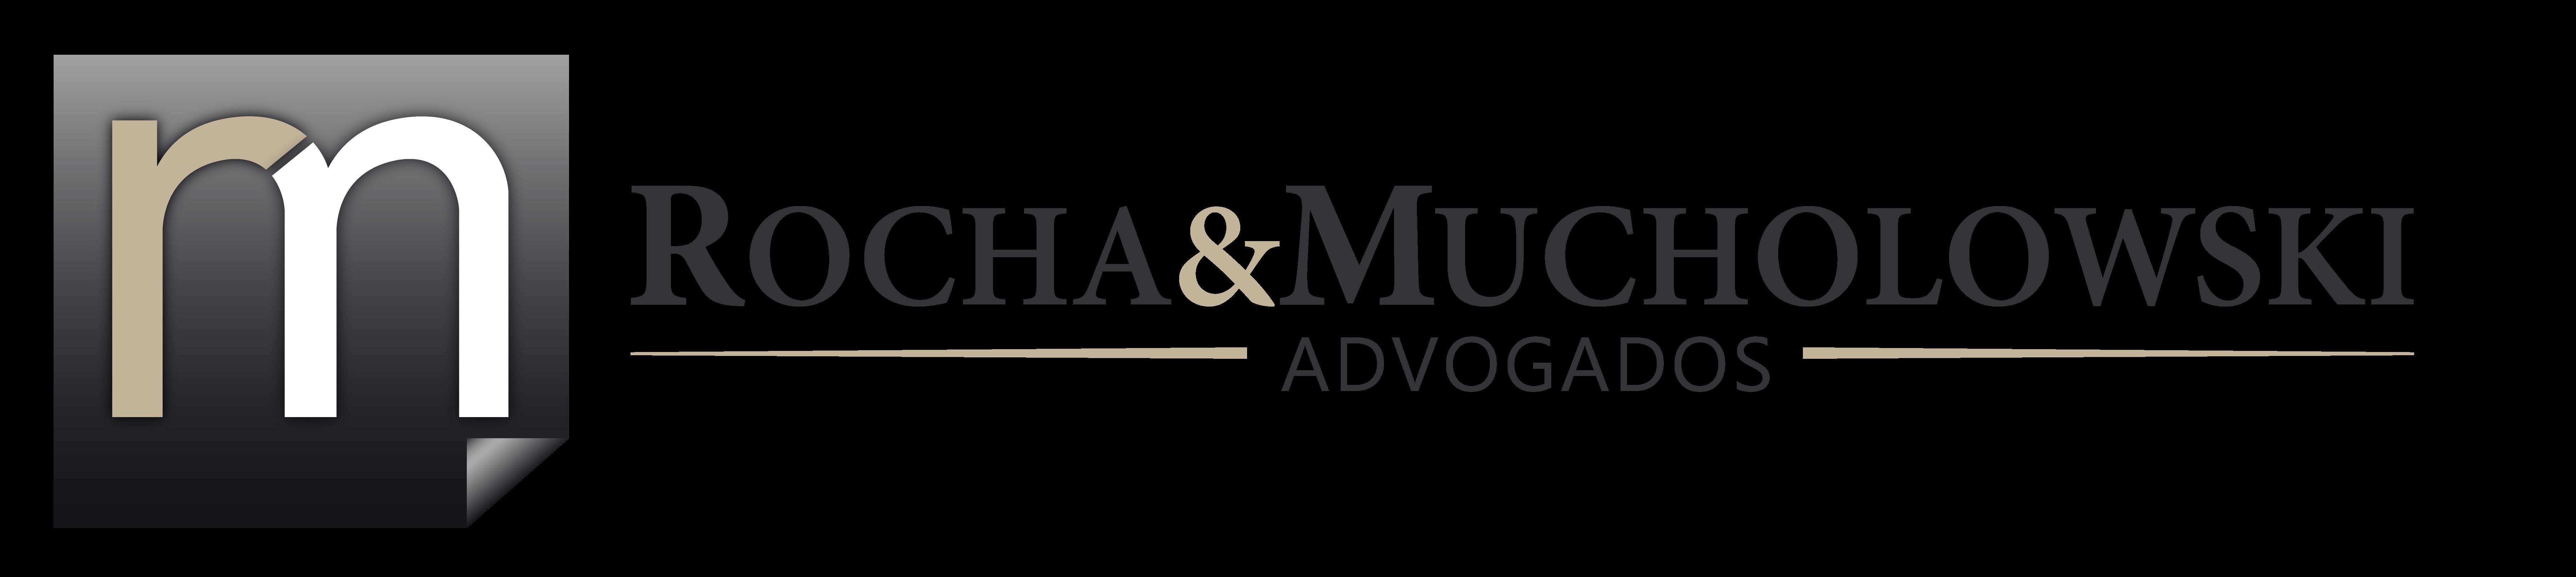 Logo - Rocha e Mucholowski - Principal - Transparencia